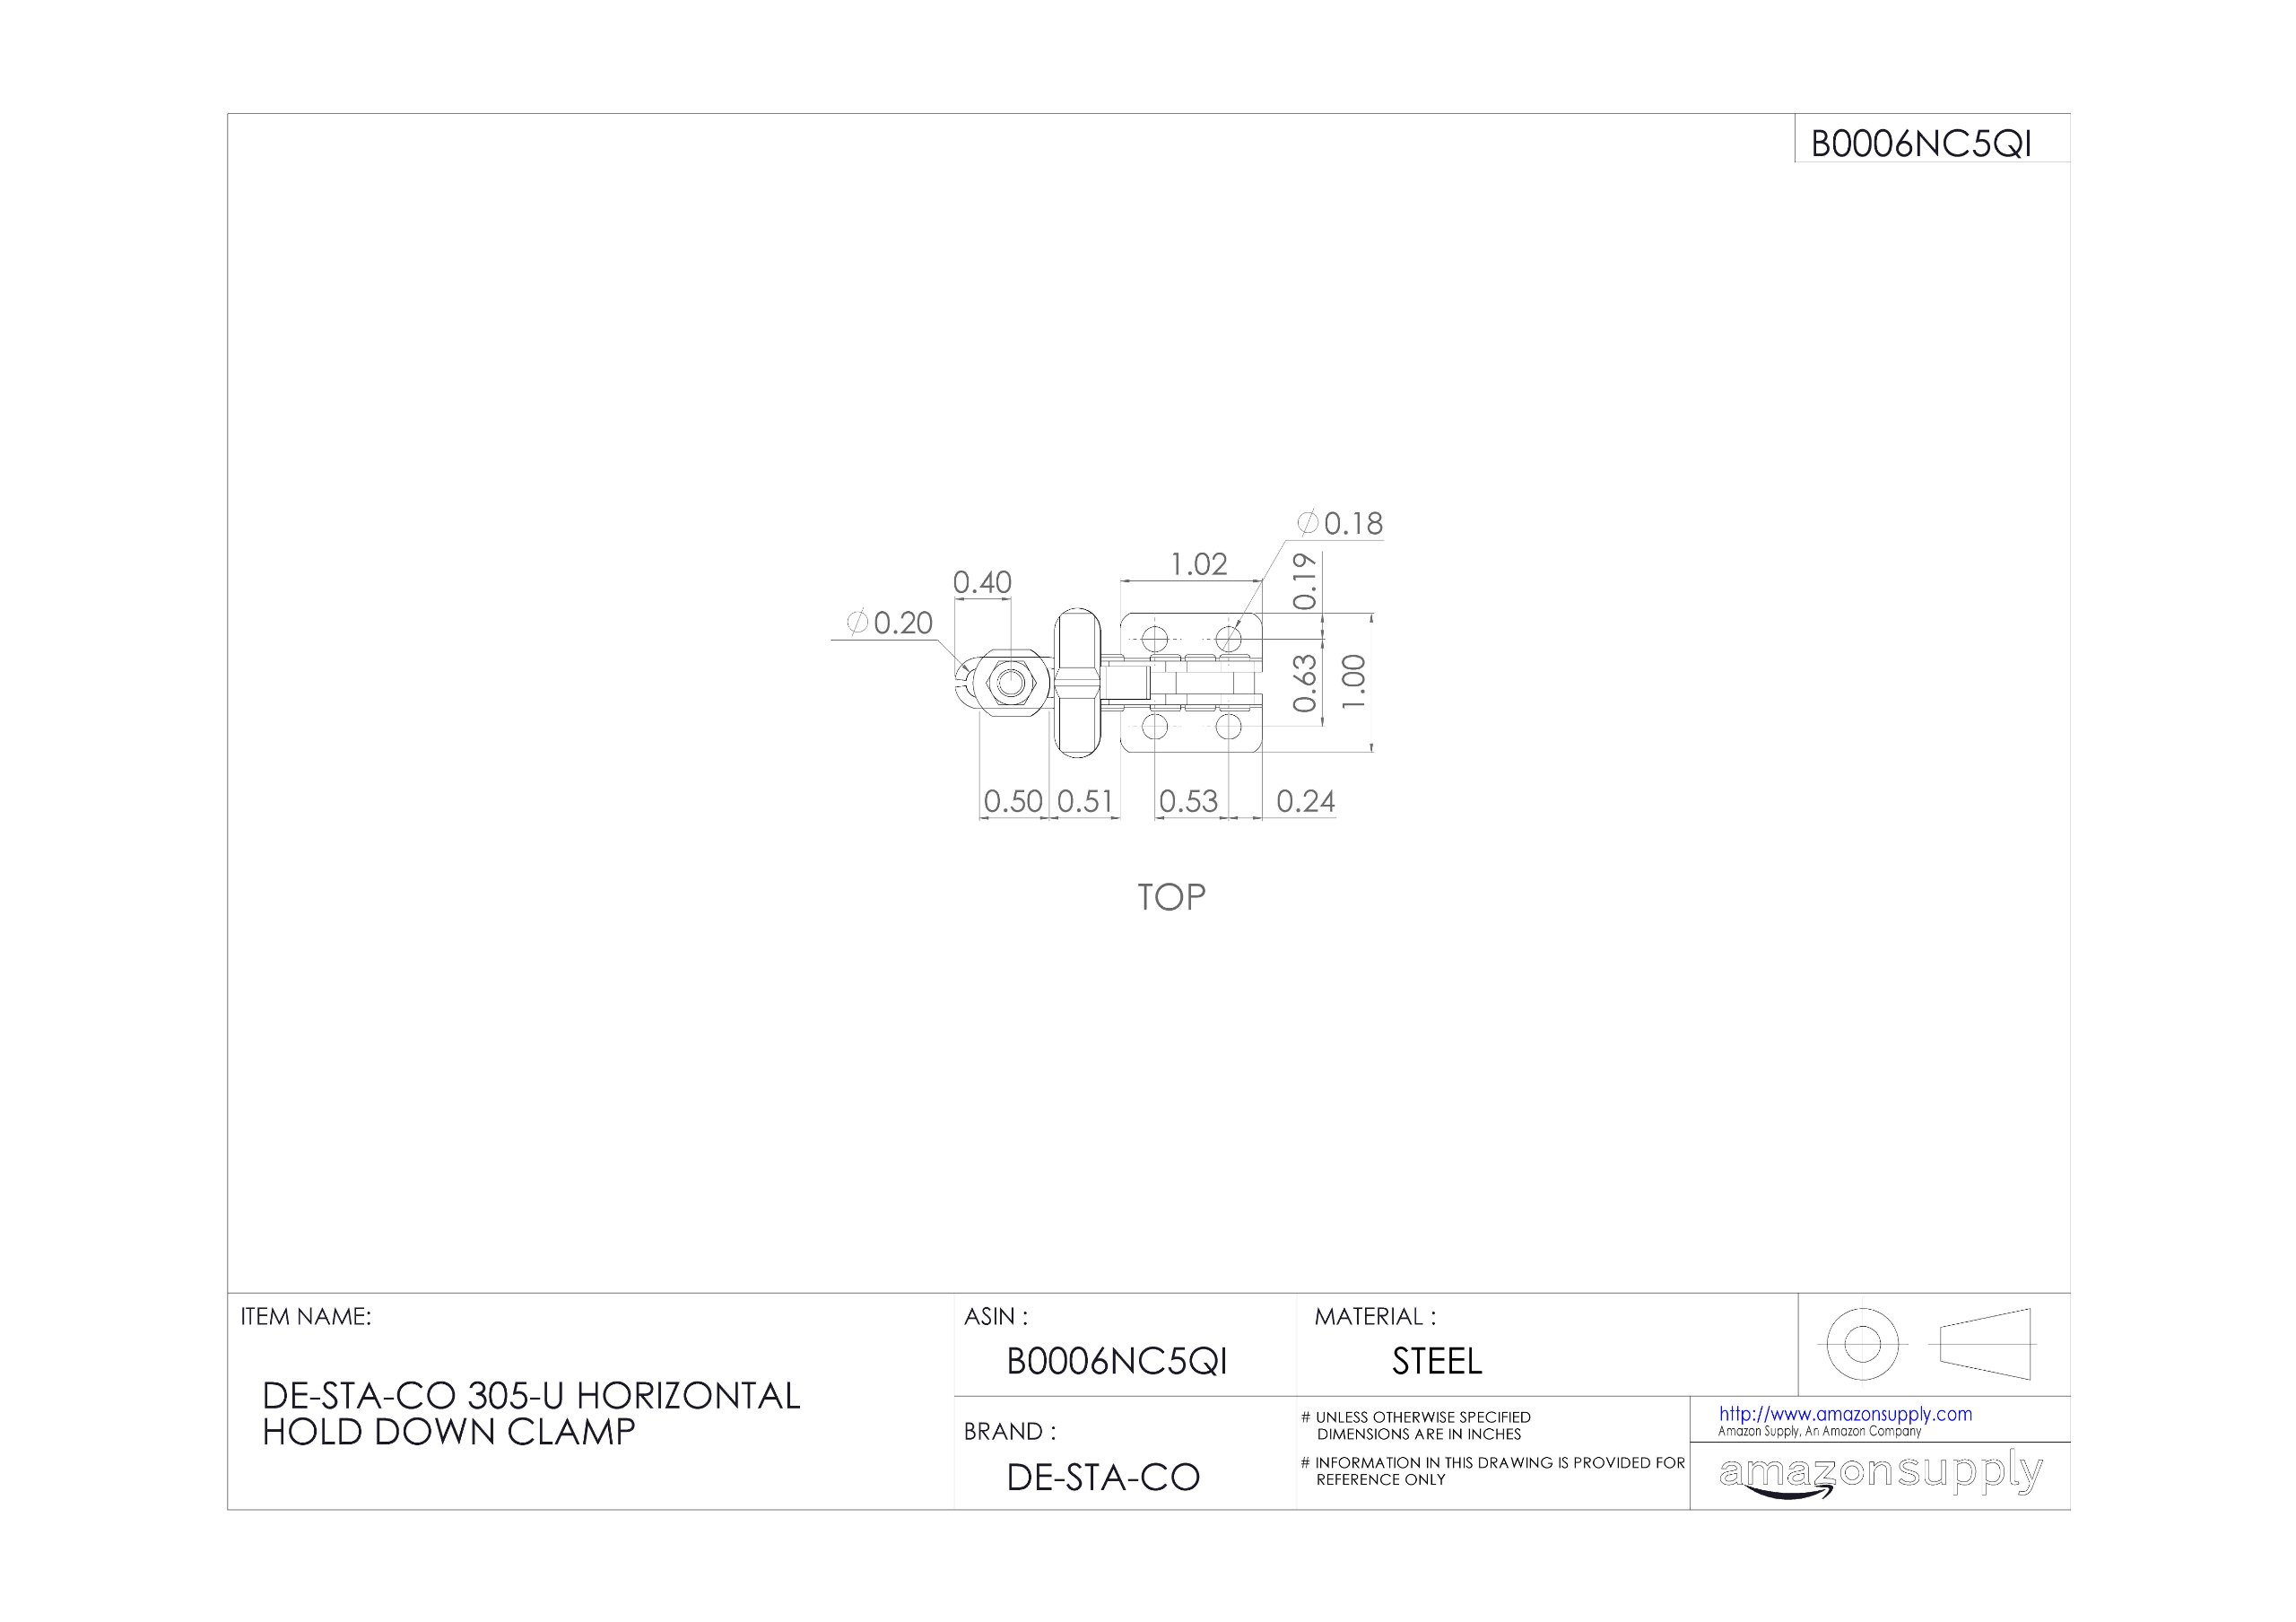 DE-STA-CO 305-U Horizontal Hold Down Clamp by De-Sta-Co (Image #1)